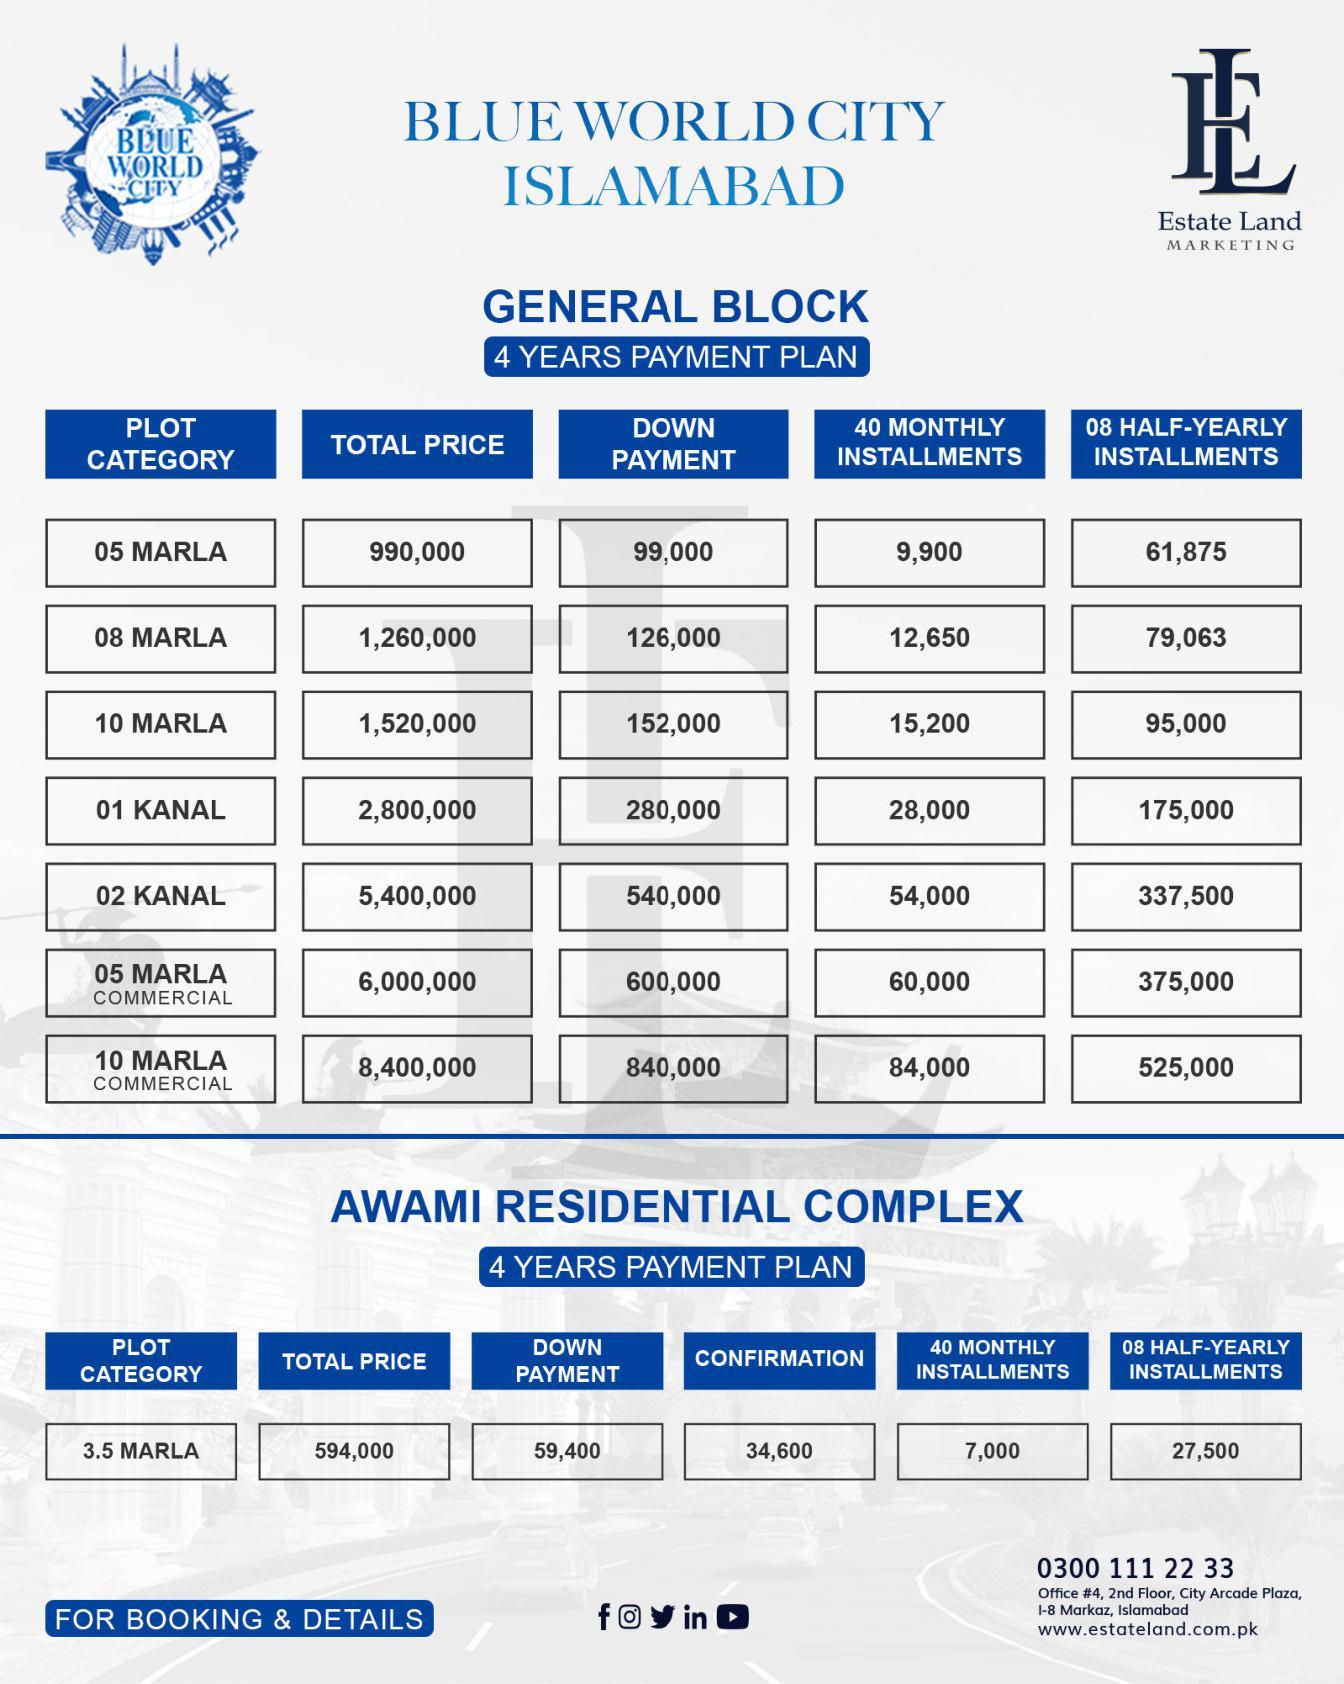 Blue World City General Block prices